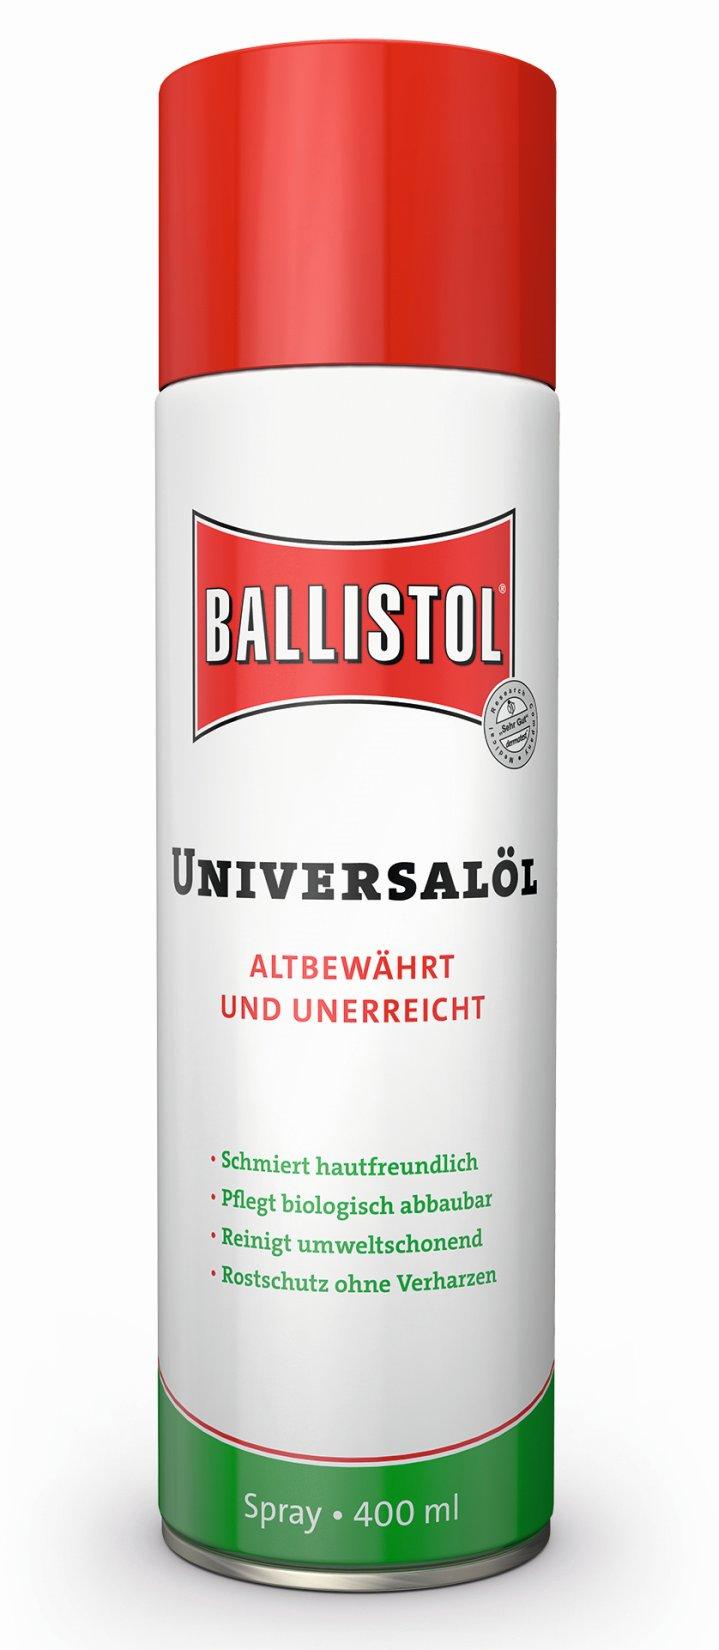 BALLISTOL Universalöl Spray, 400ml